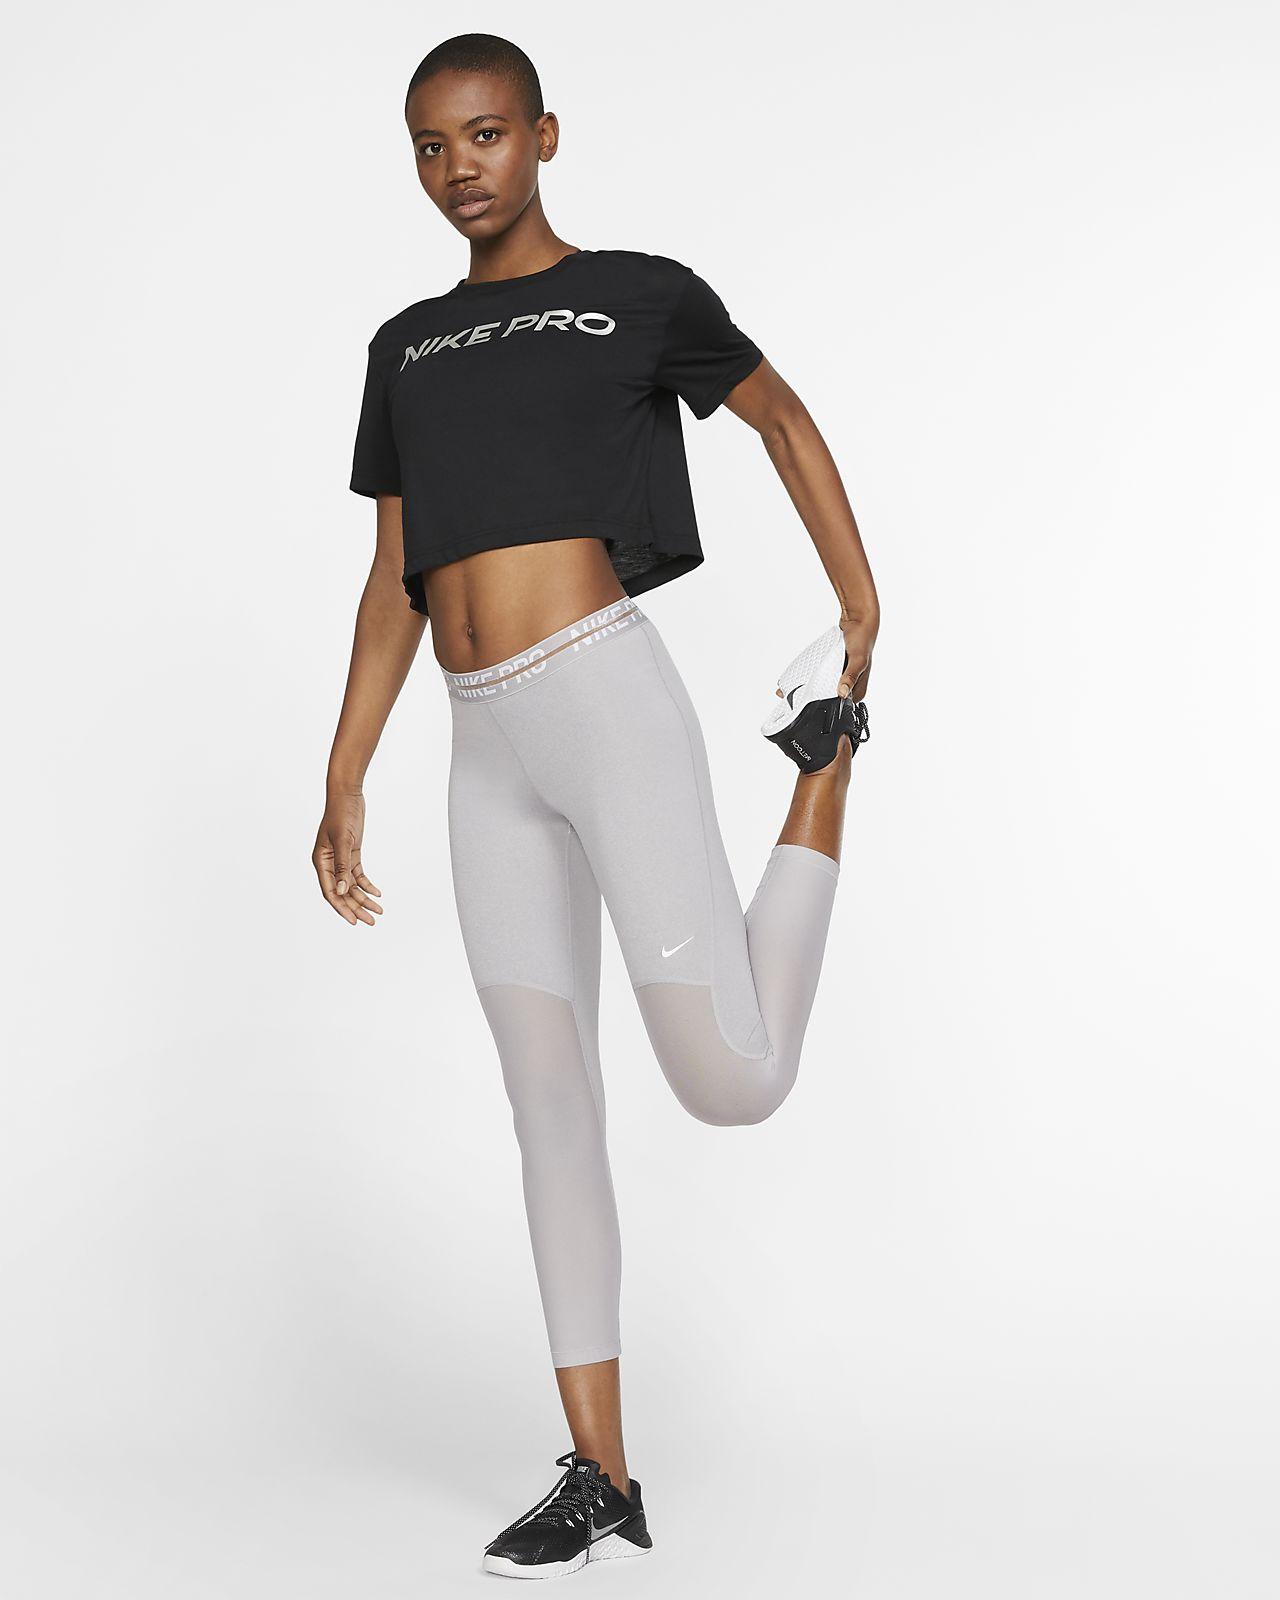 Nike Dri FIT Women's Training T Shirt